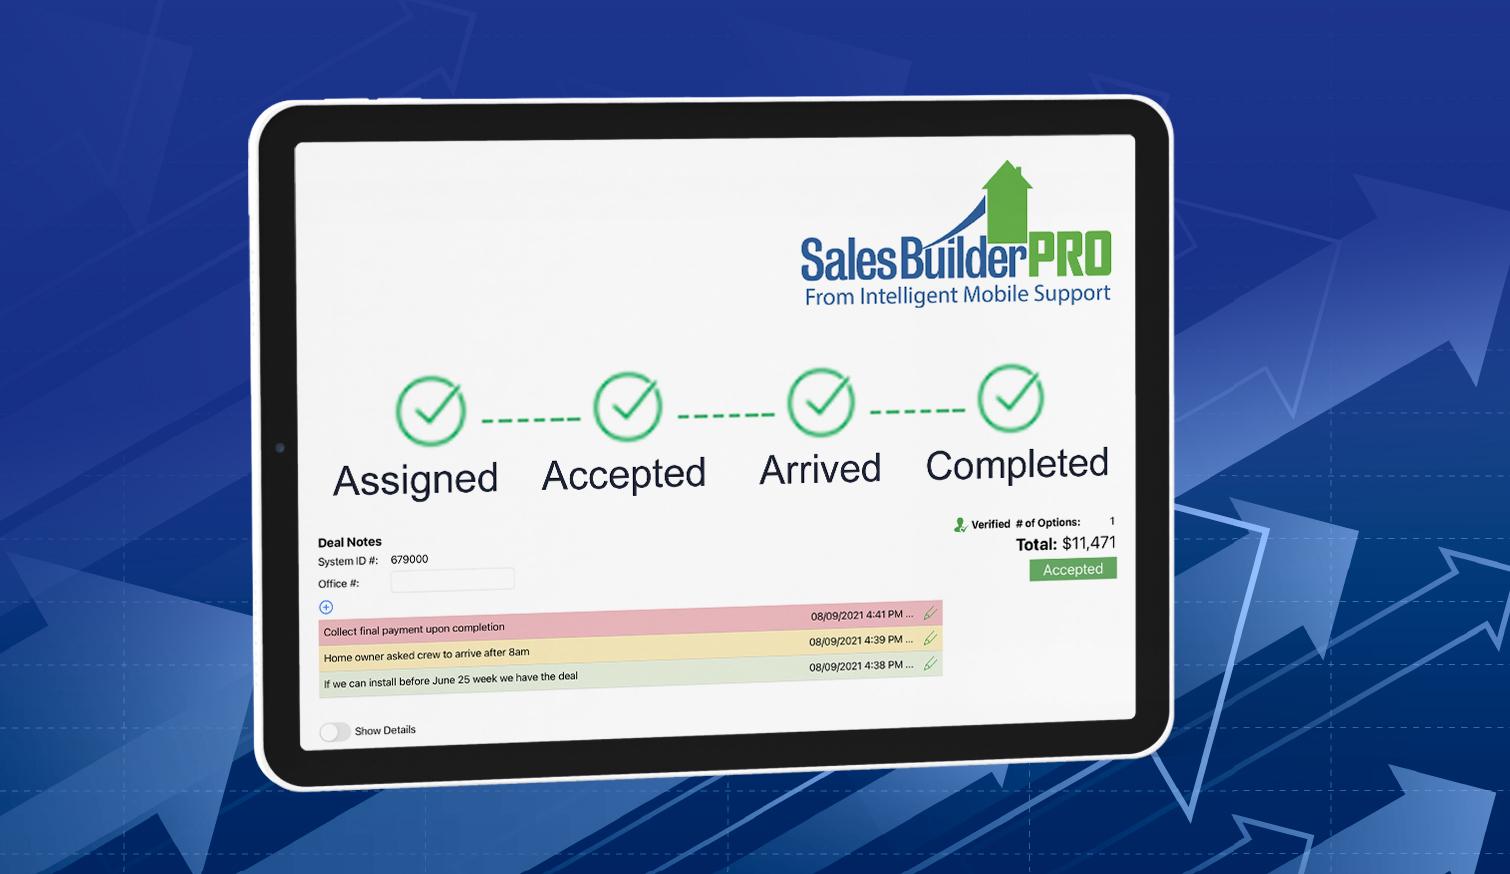 SalesBuilder Pro on an iPad